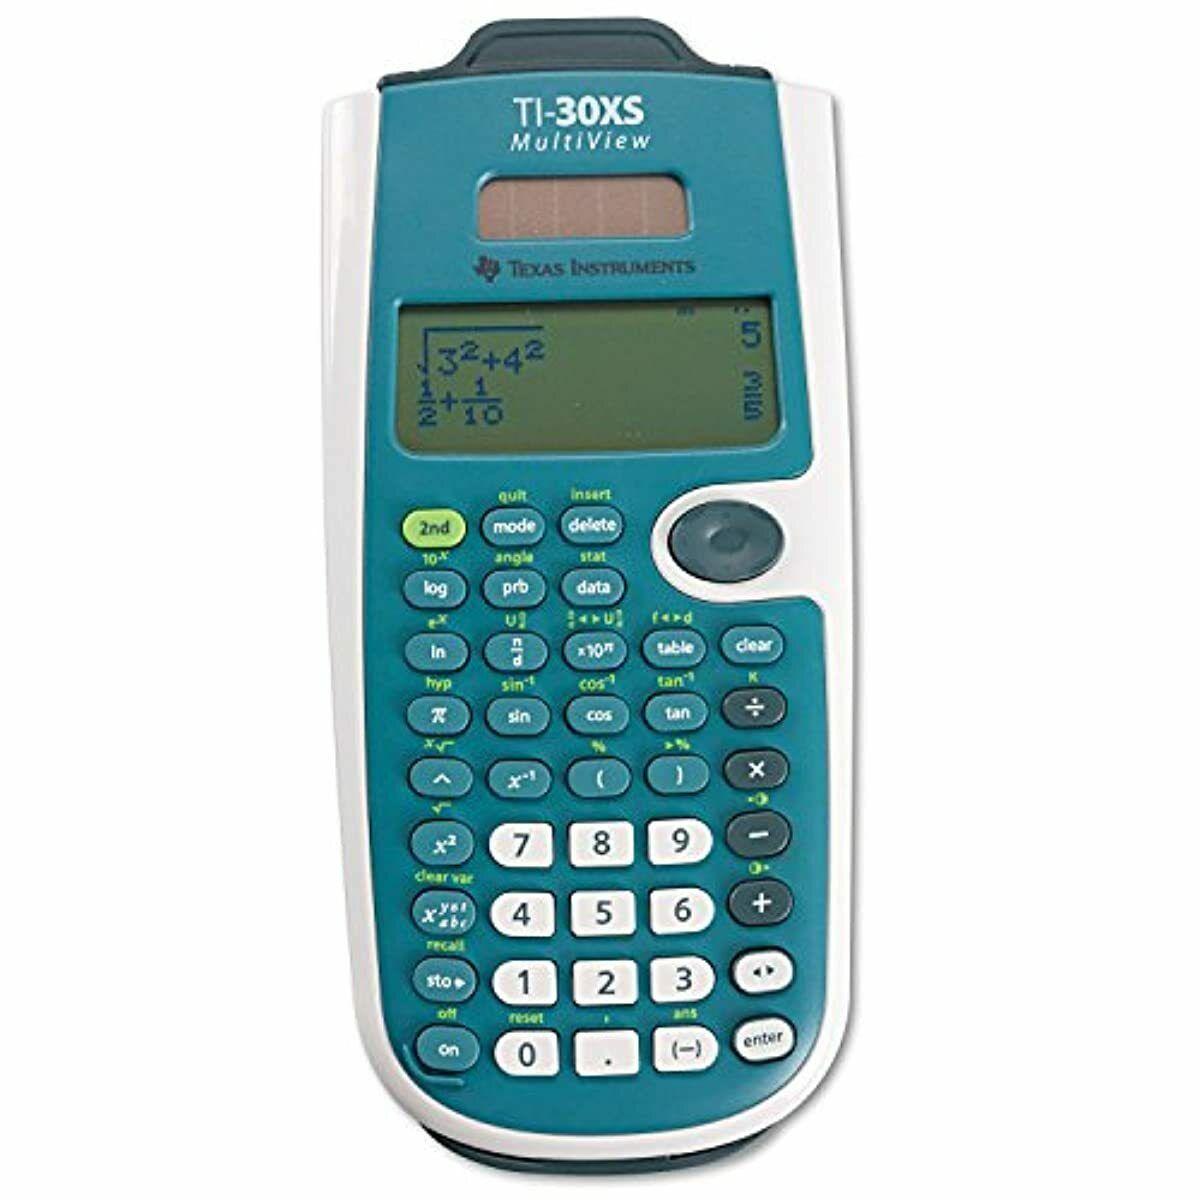 instruments ti 30xs multiview scientific calculator